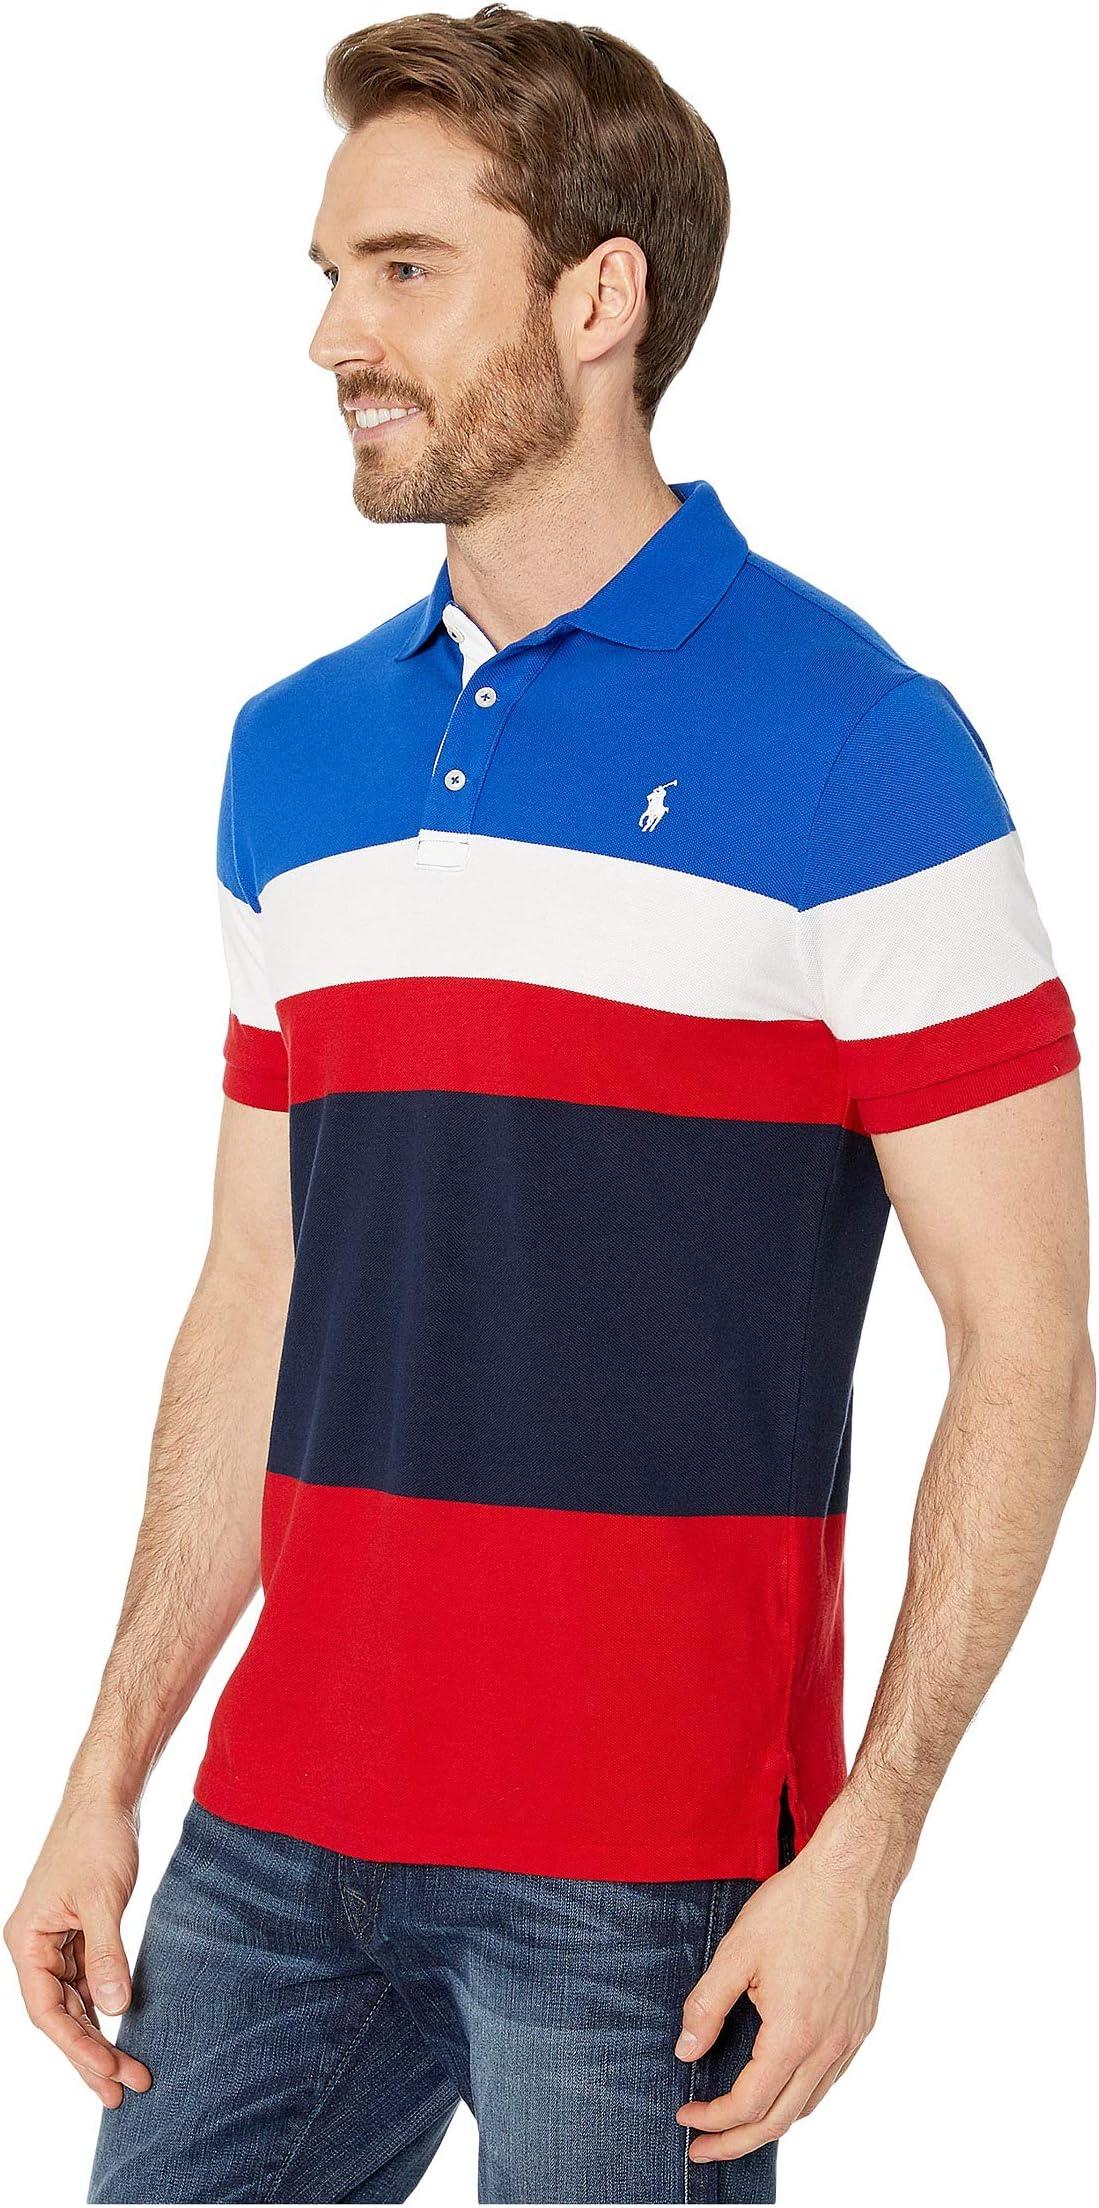 Polo Ralph Lauren Slim Fit Color Block Mesh Polo tU5U2